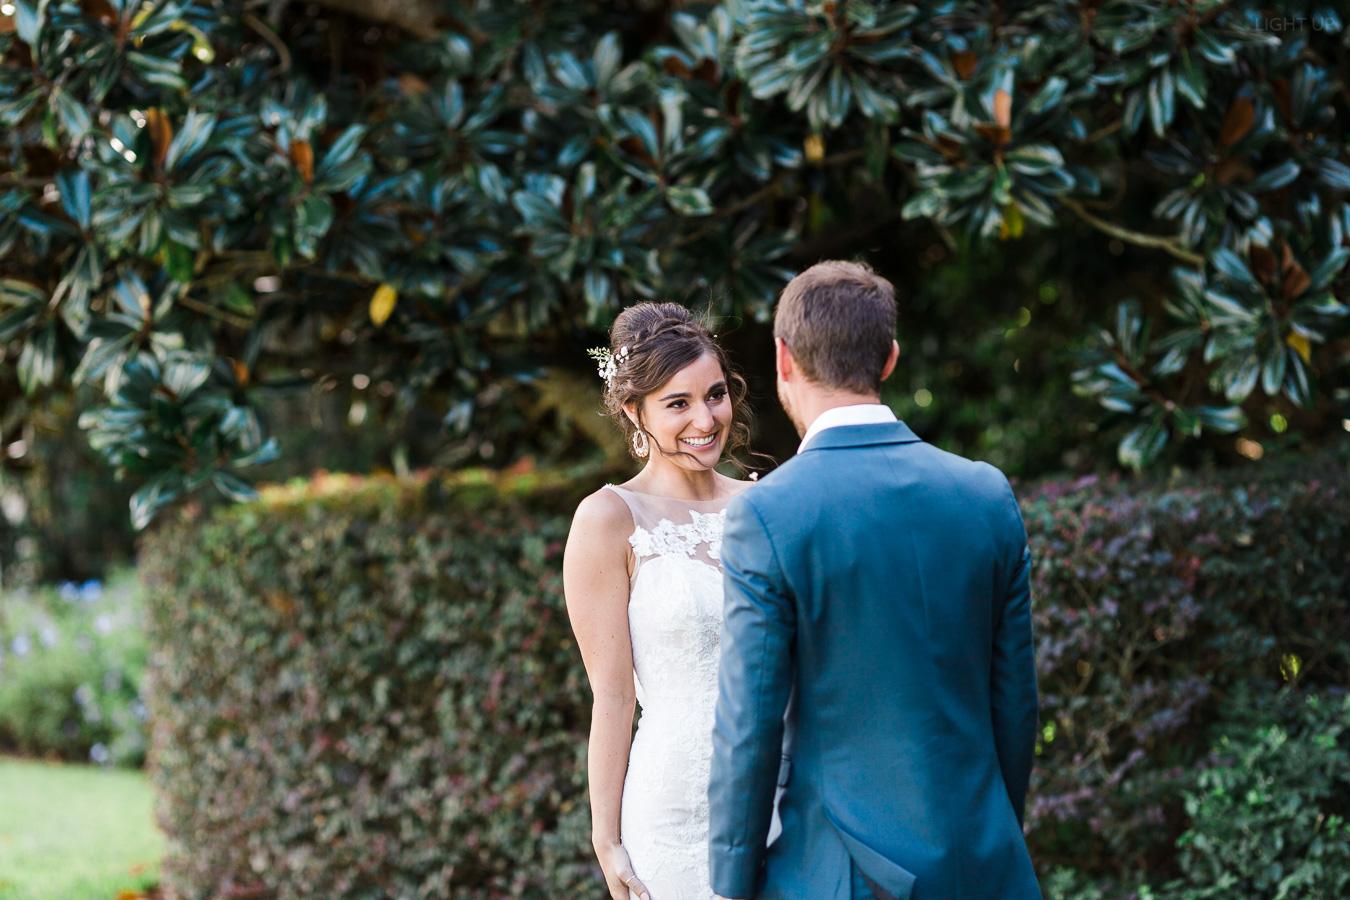 Wedding-photographer-orlando-32.jpg